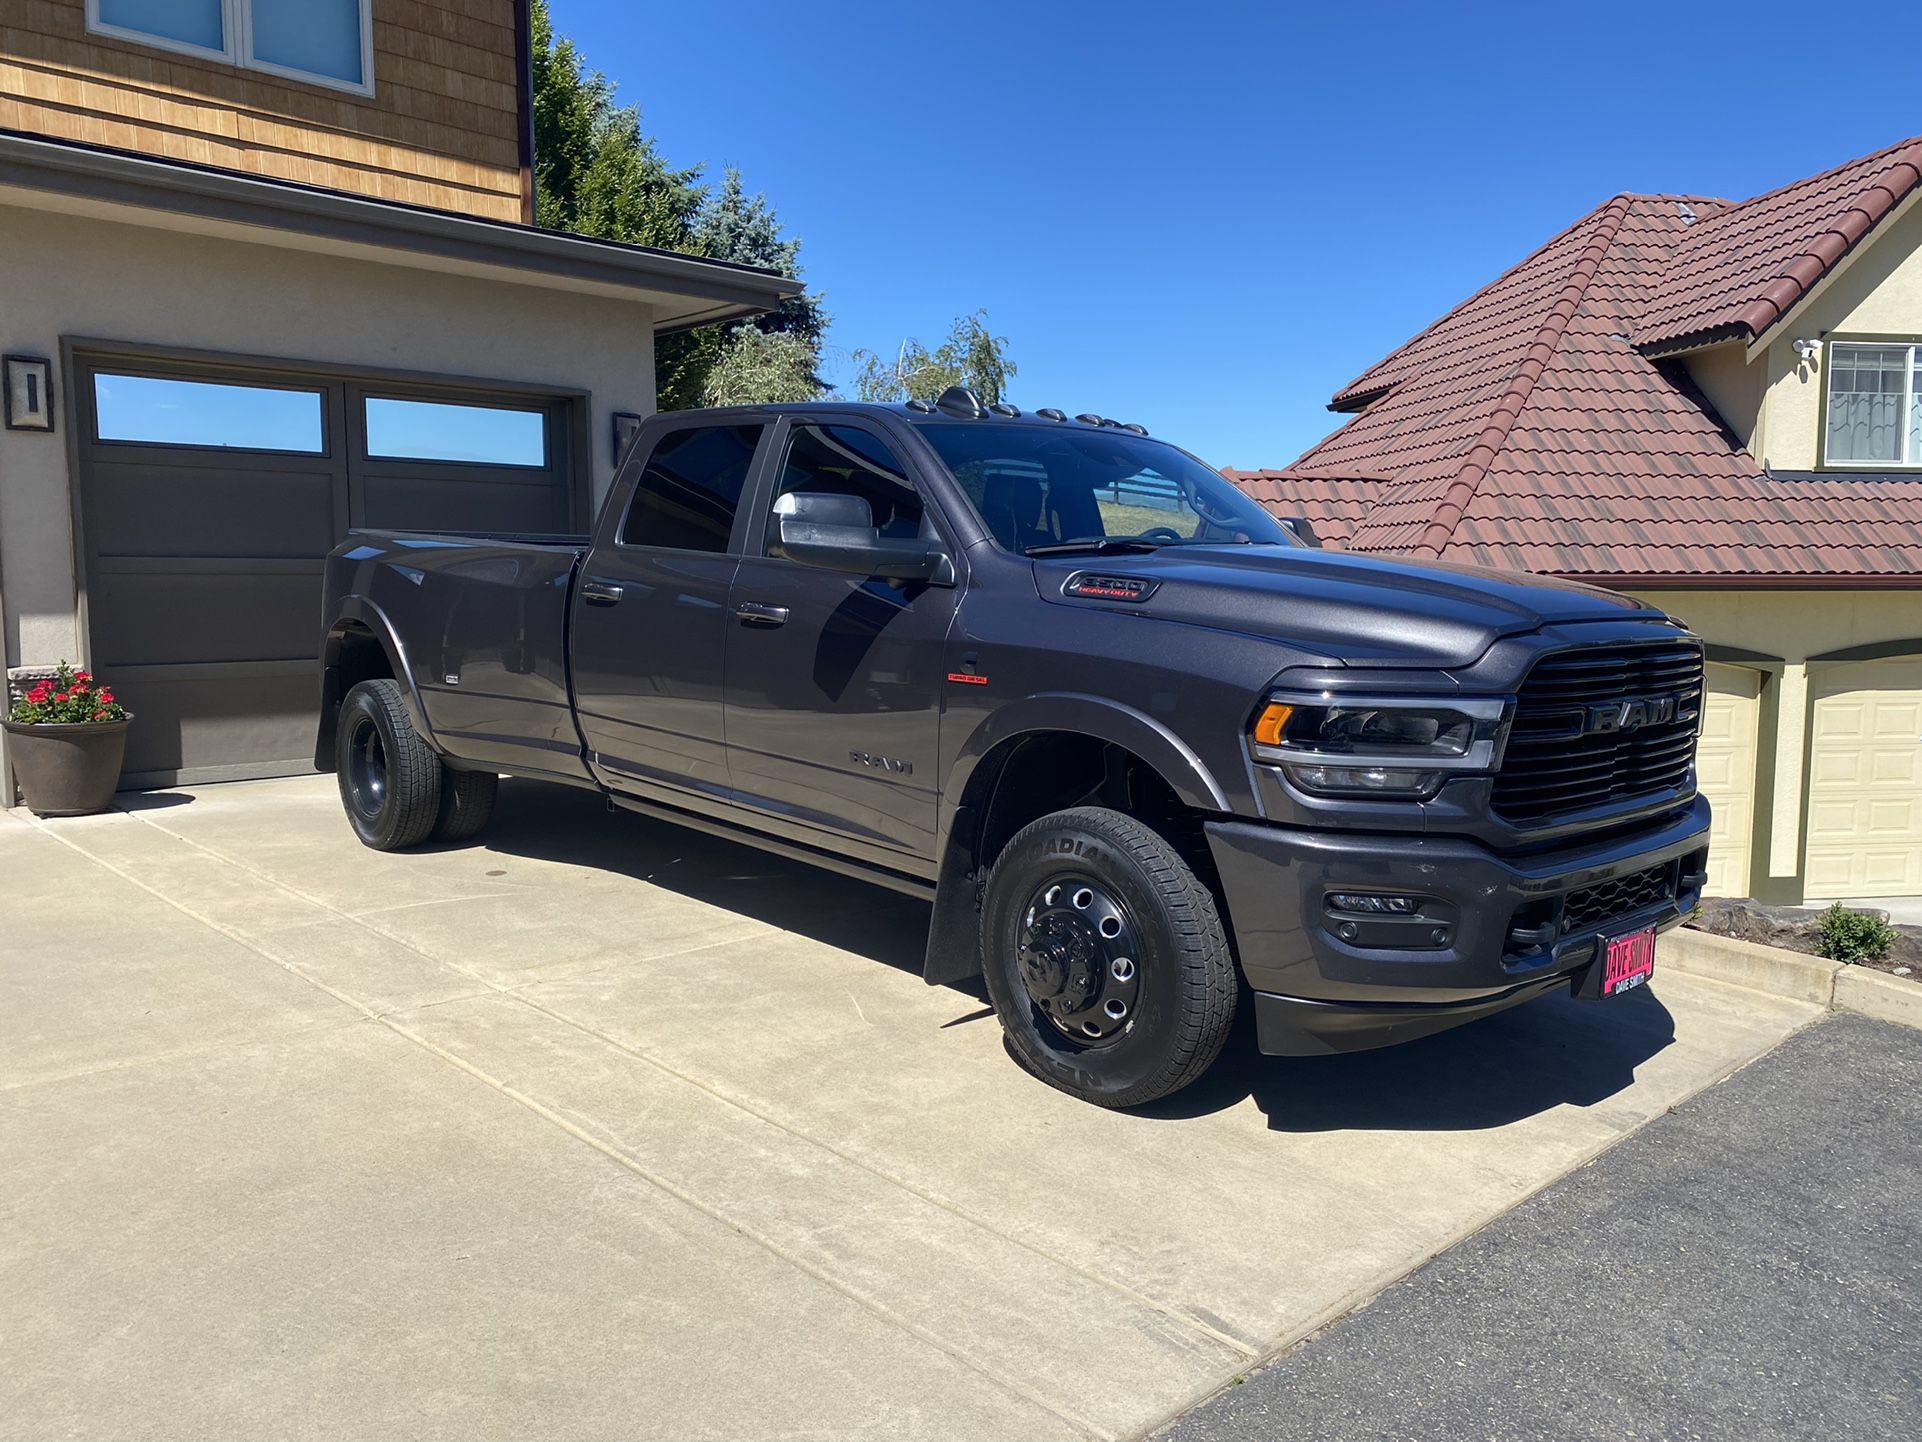 RAM OEM Alcoa Factory Black Dually Wheels and Tires